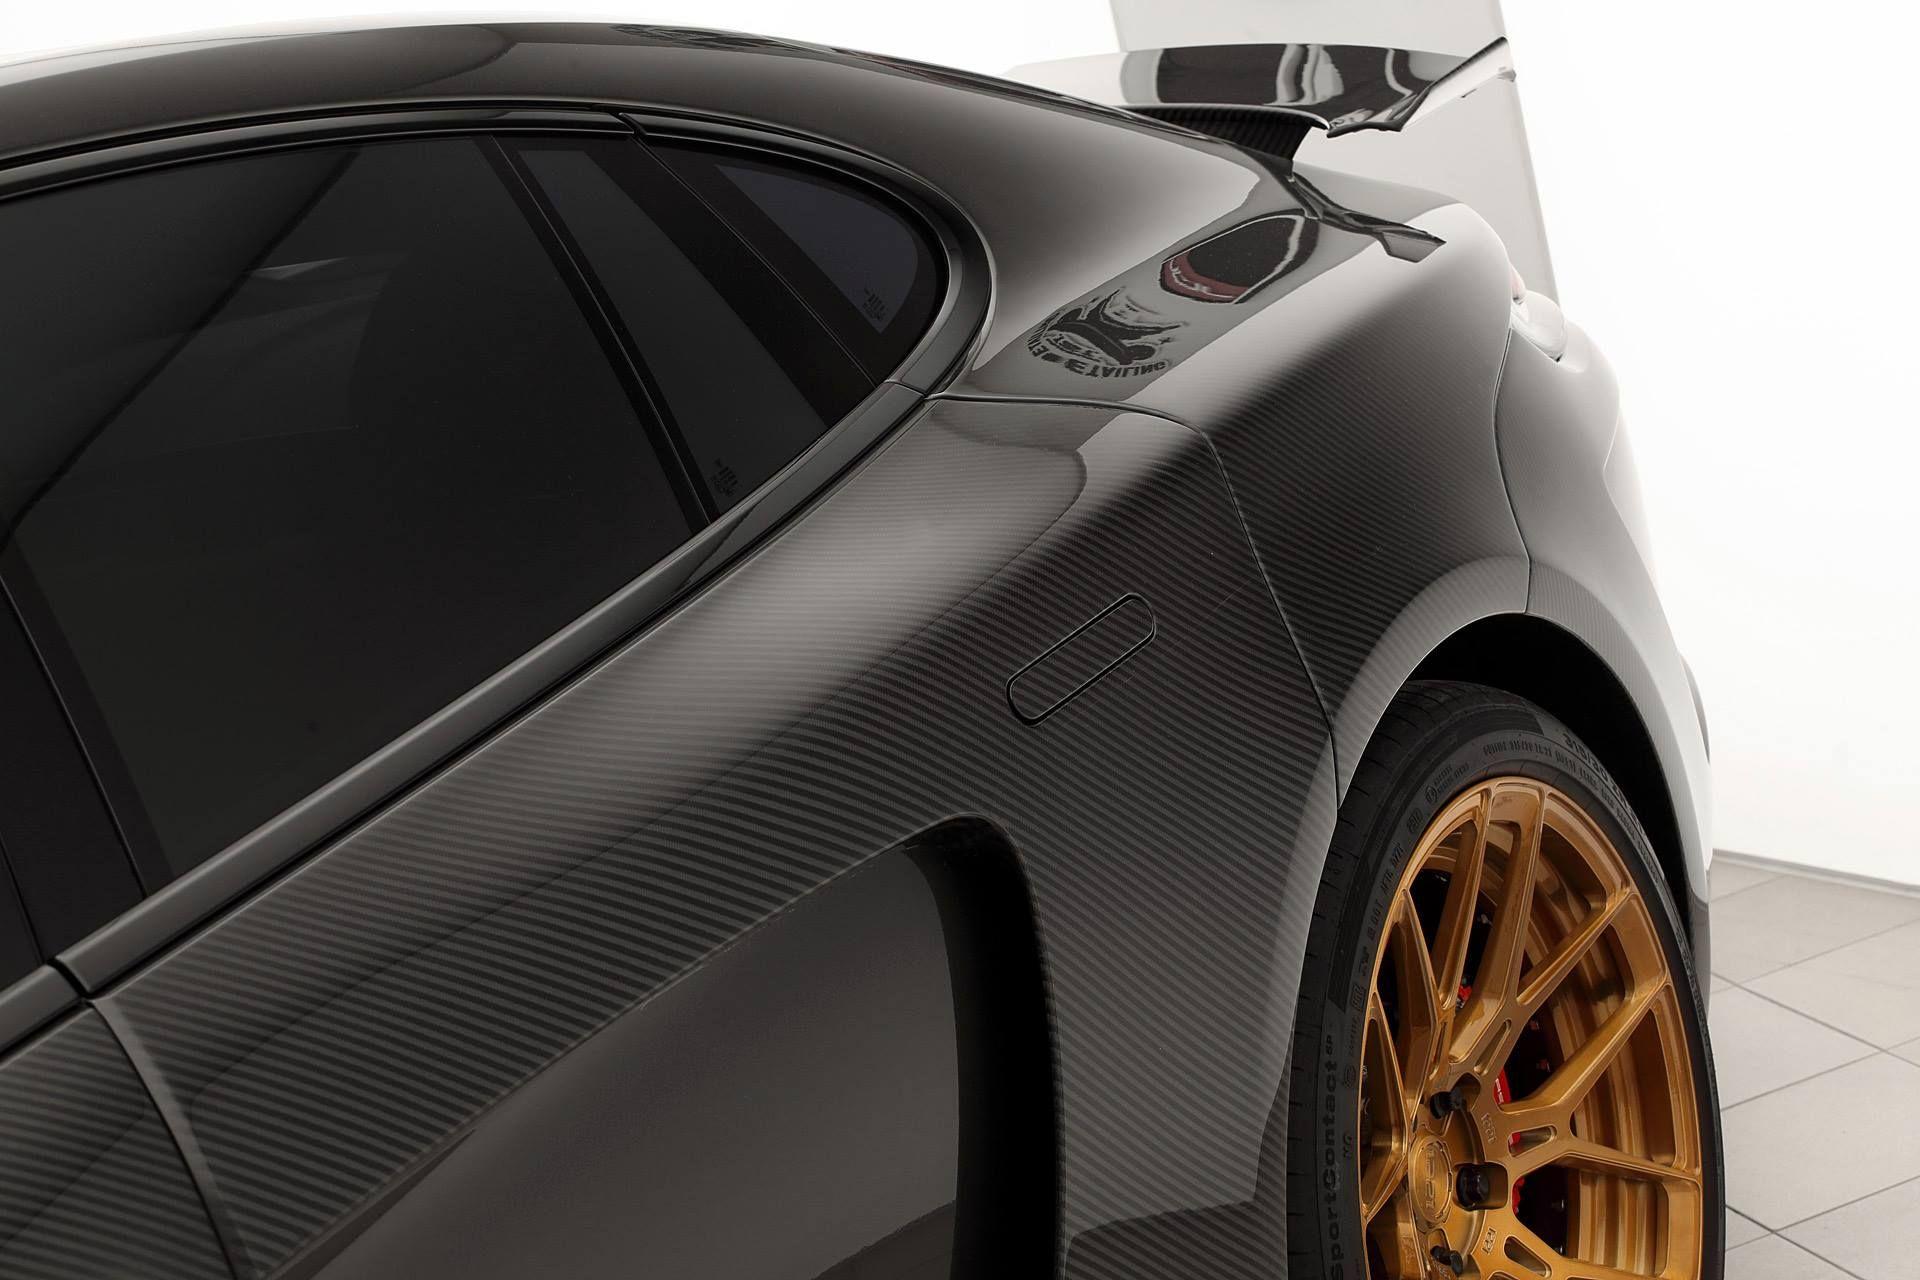 Porsche_Panamera_GTR_Carbon_Edition_by_TopCar_0008